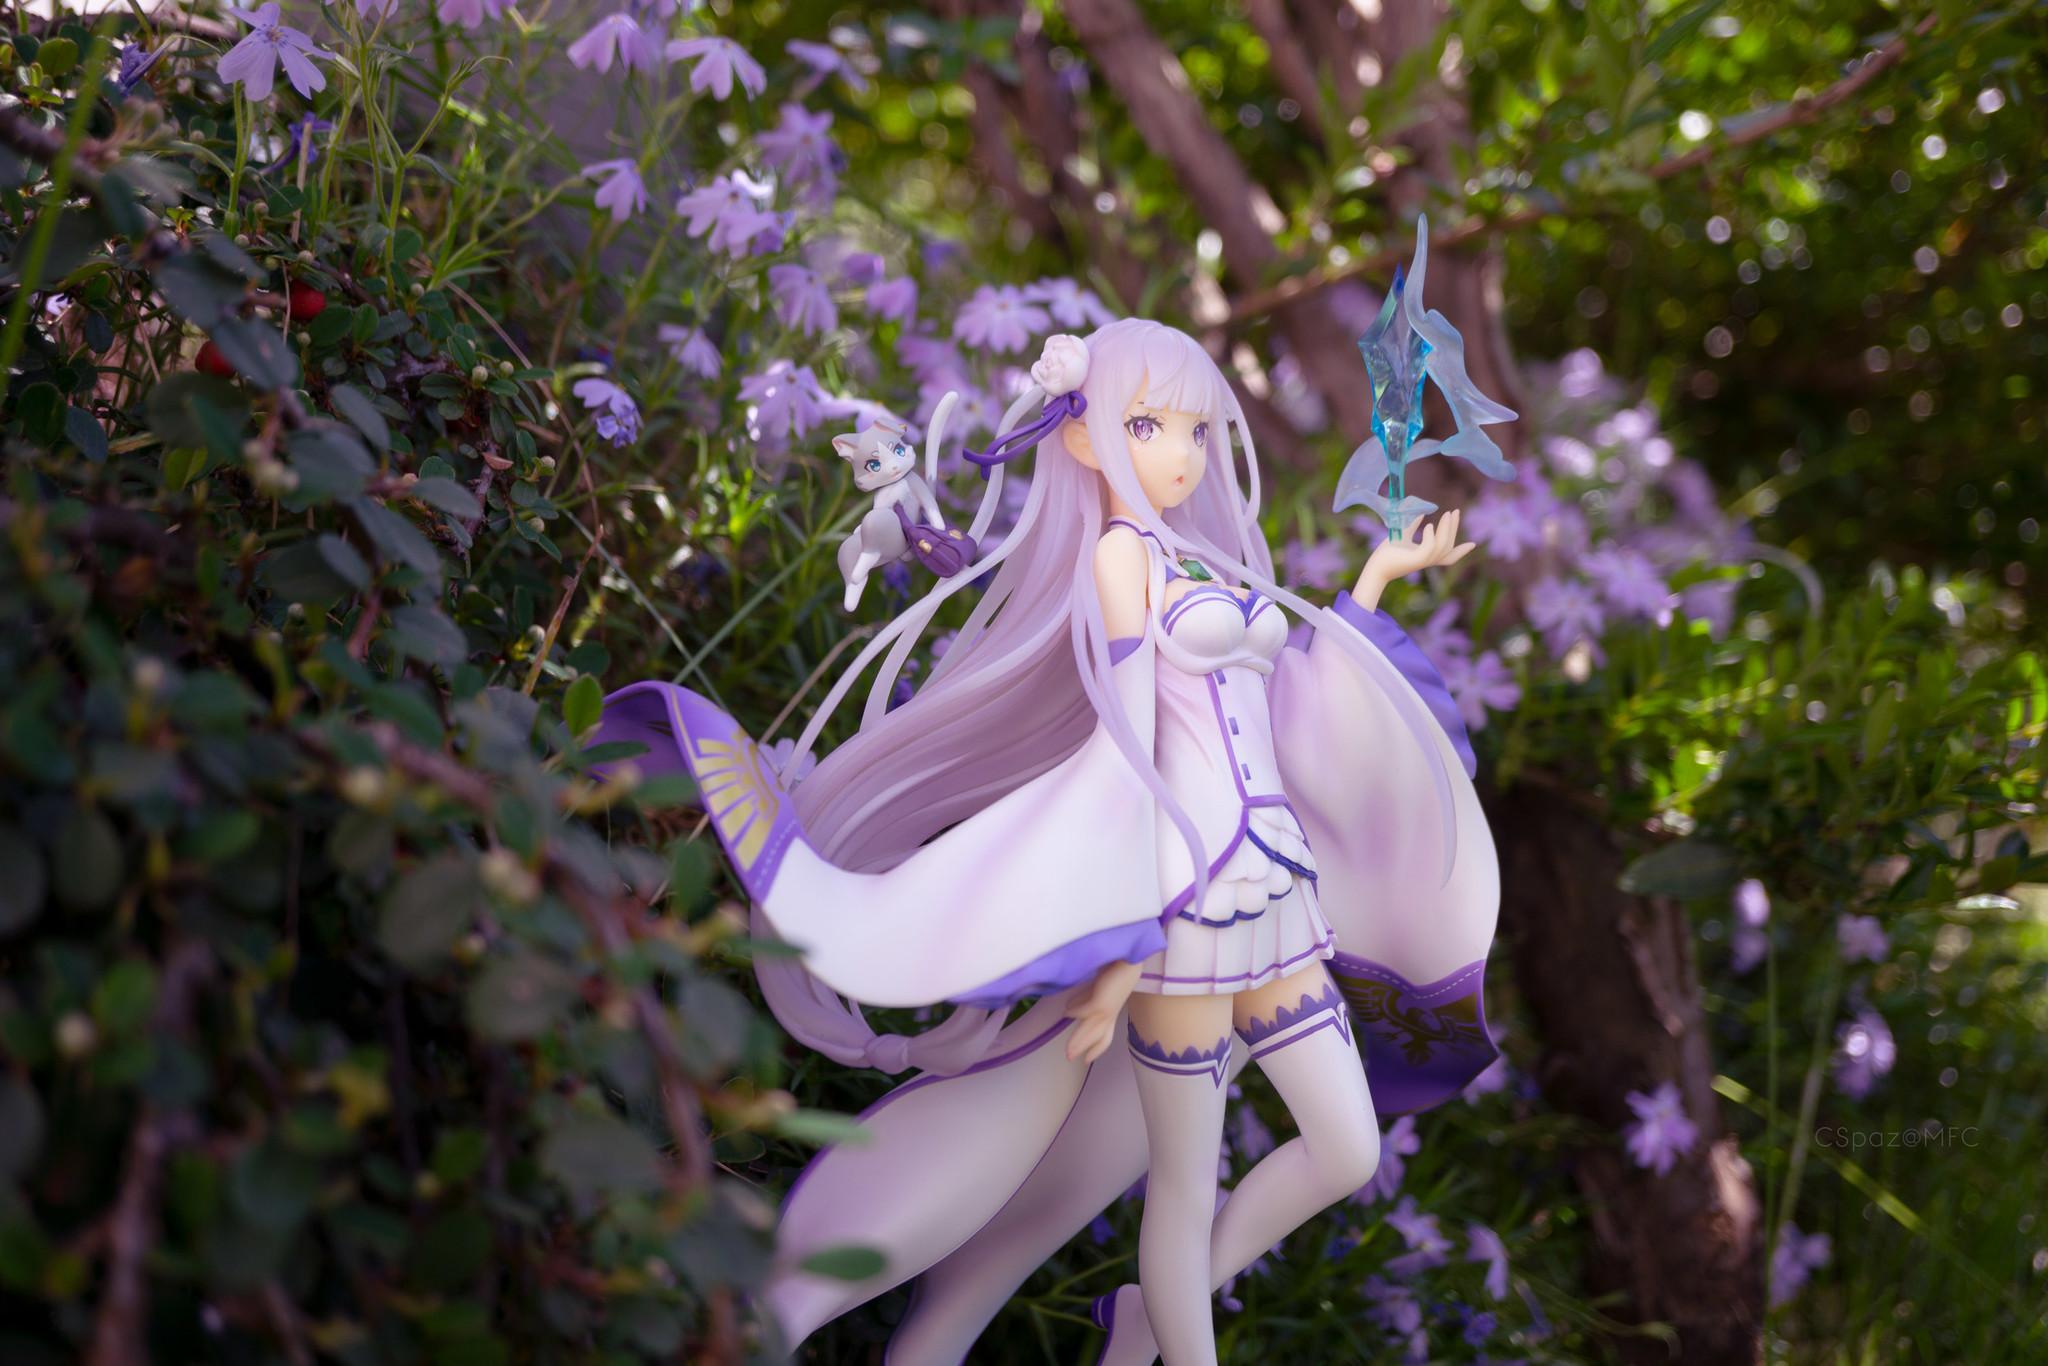 Emilia with flowers